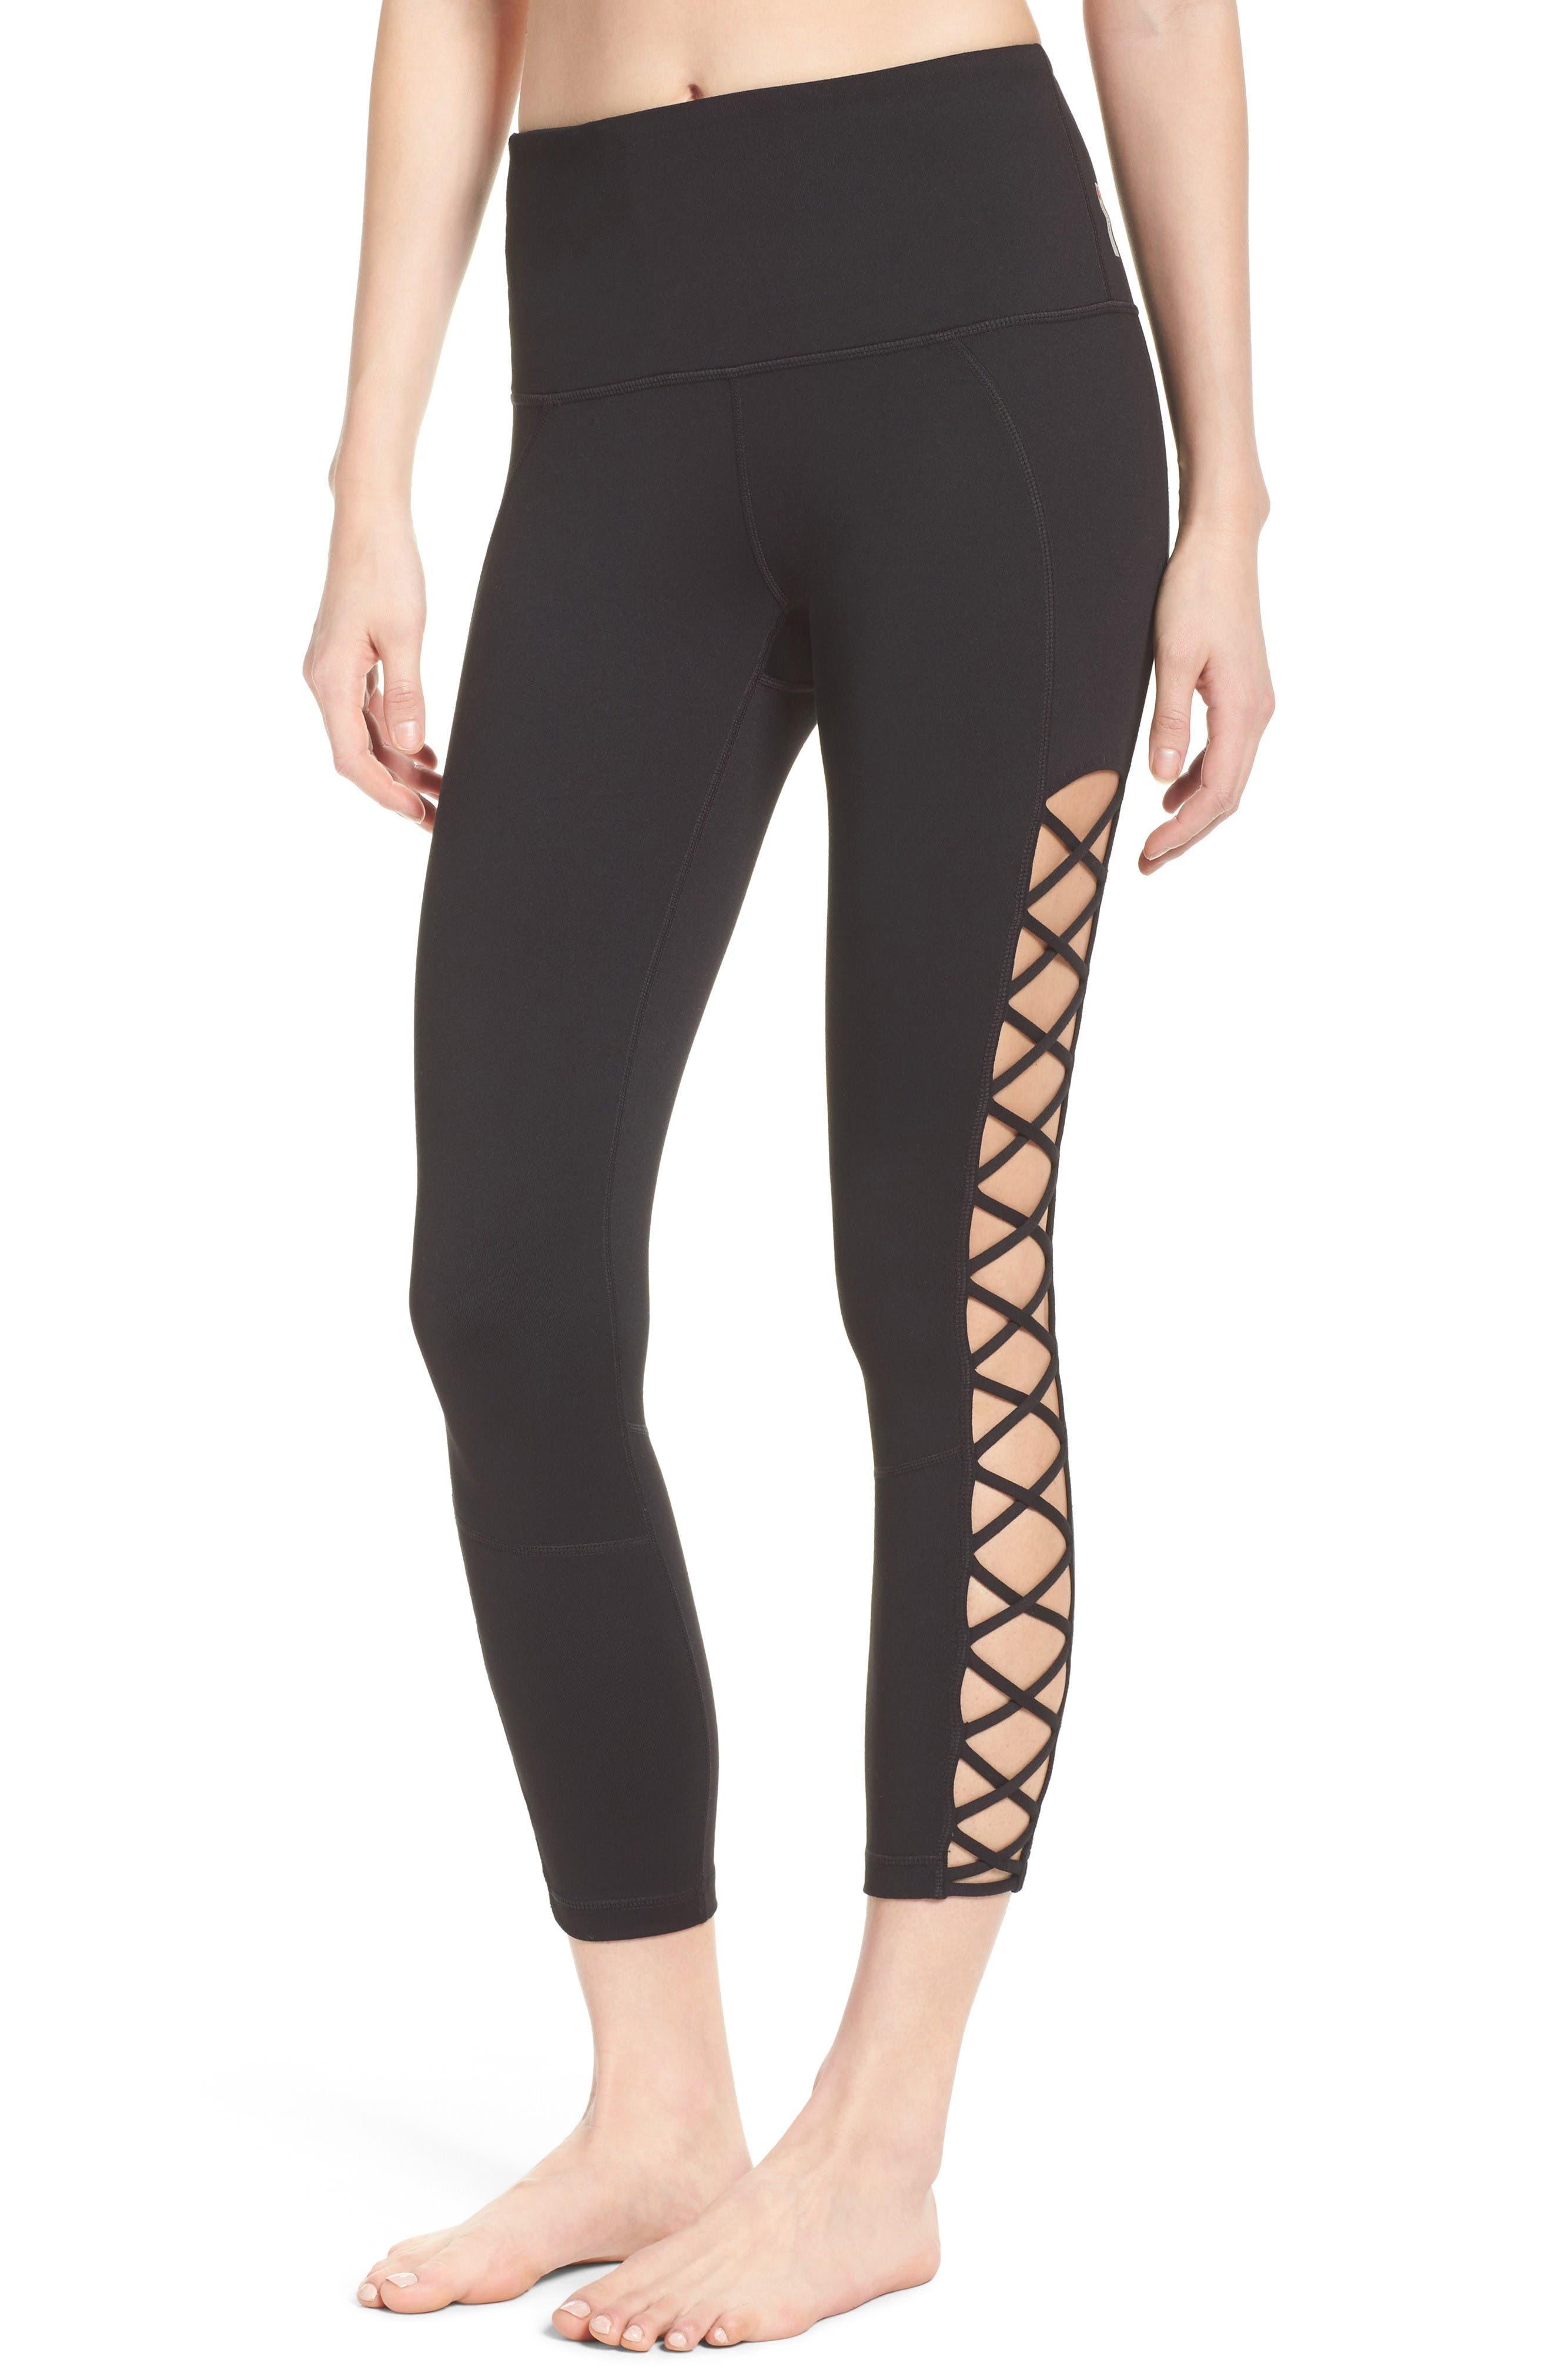 Alternate Image 1 Selected - Zella Lace It Up High Waist Midi Leggings